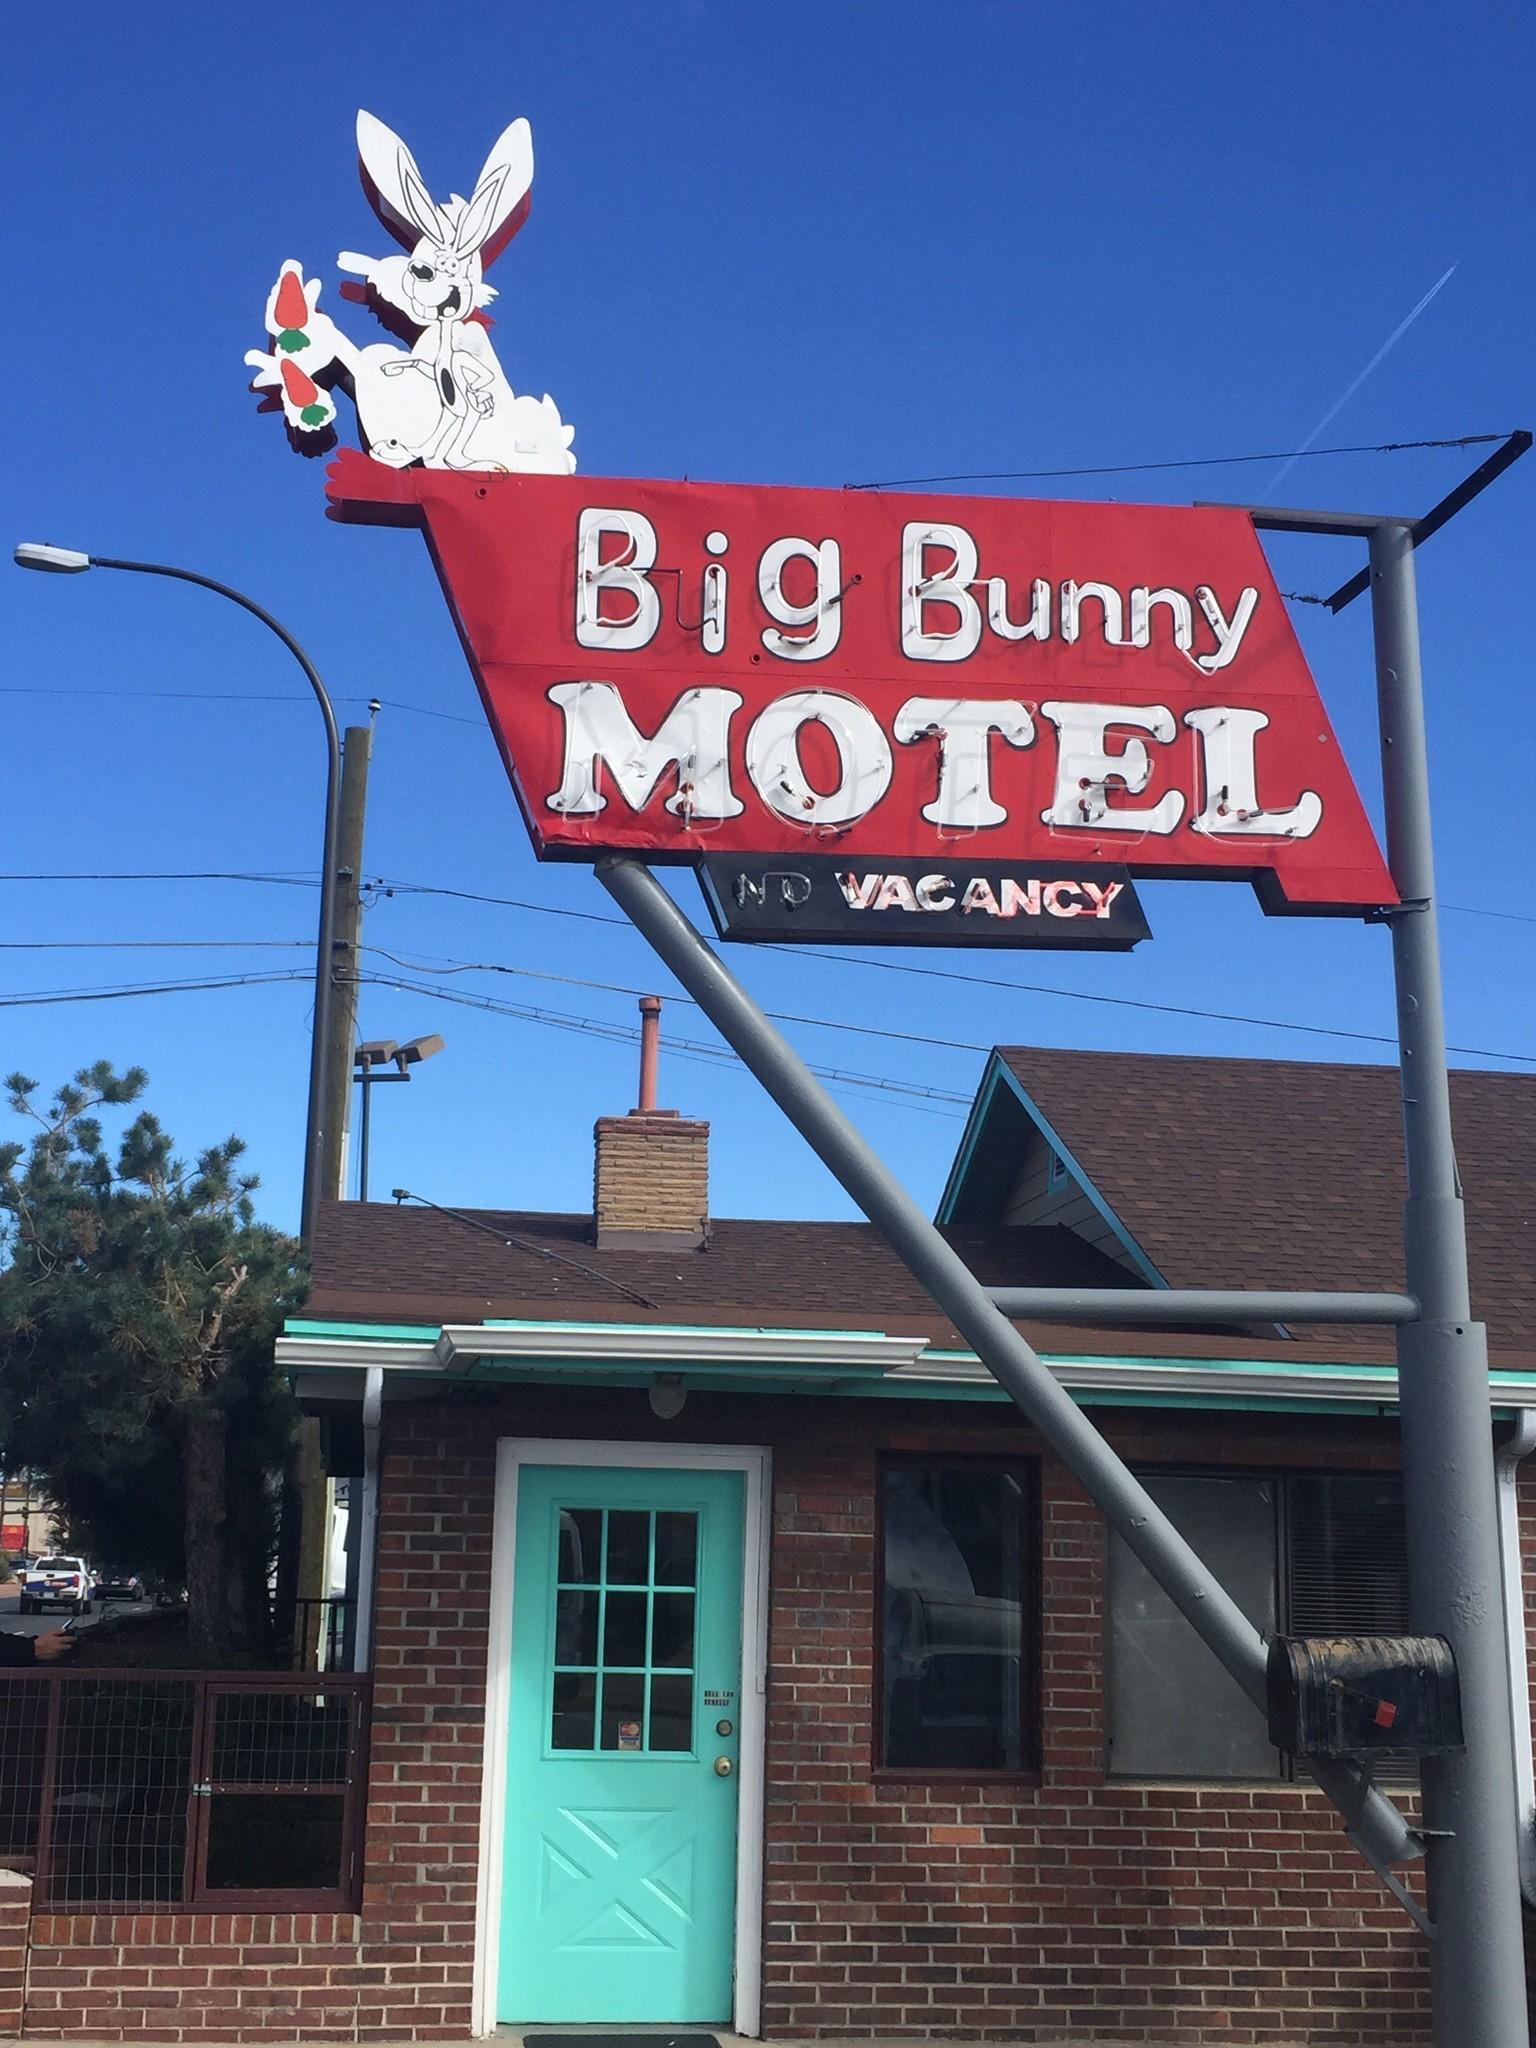 Big Bunny Motel